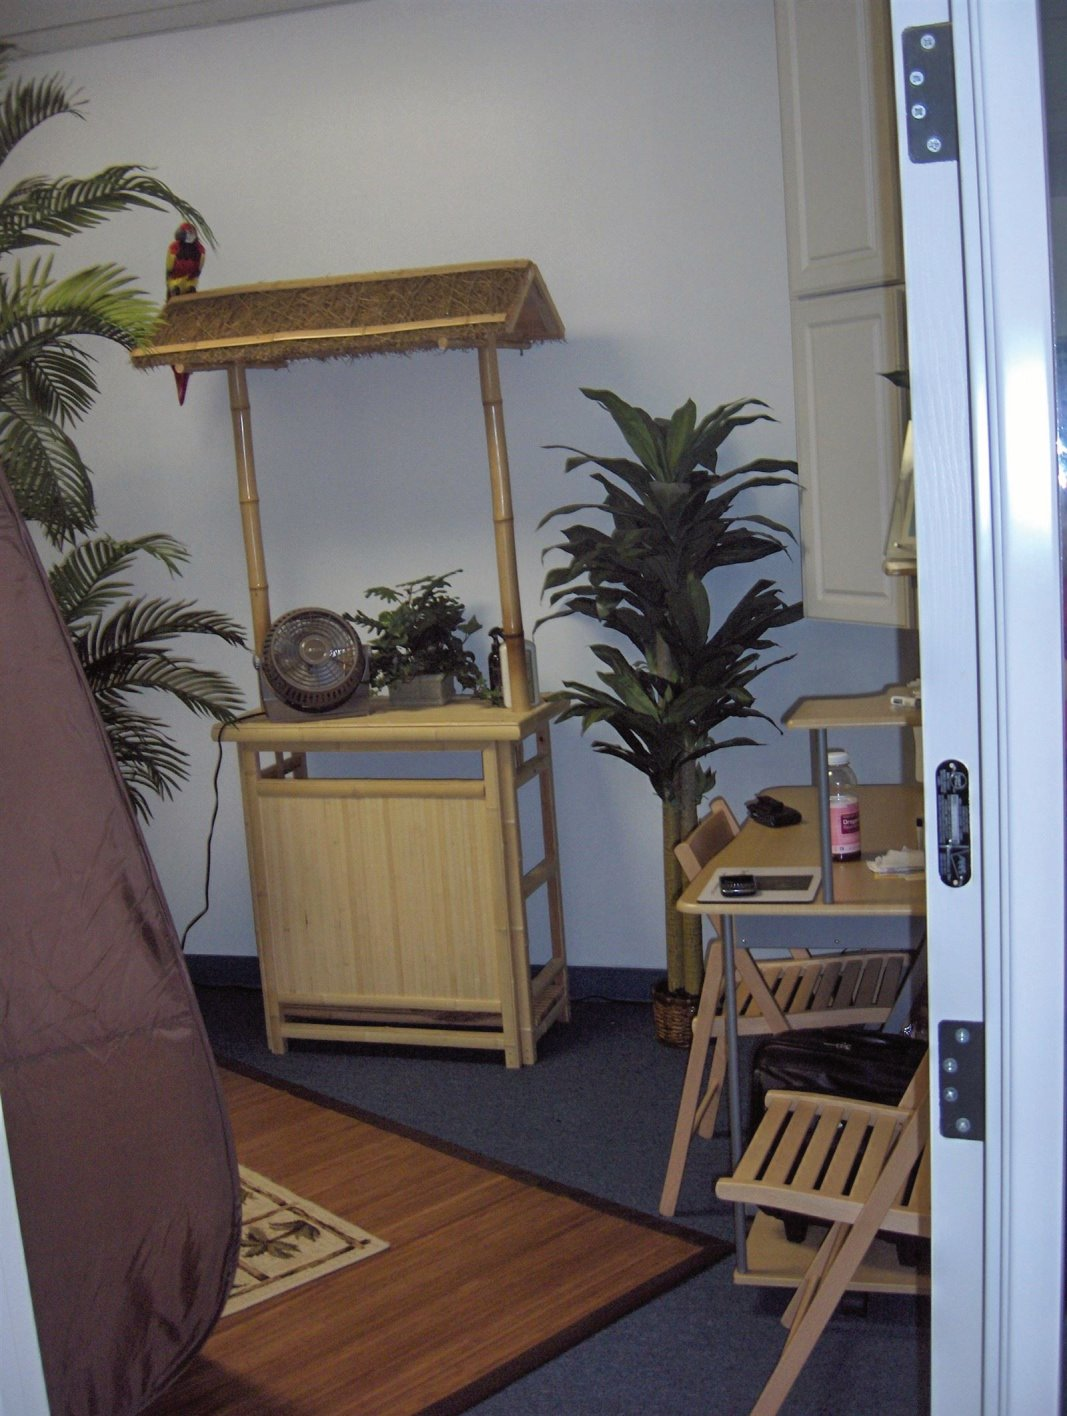 Spray Tan Room with Tiki Bar